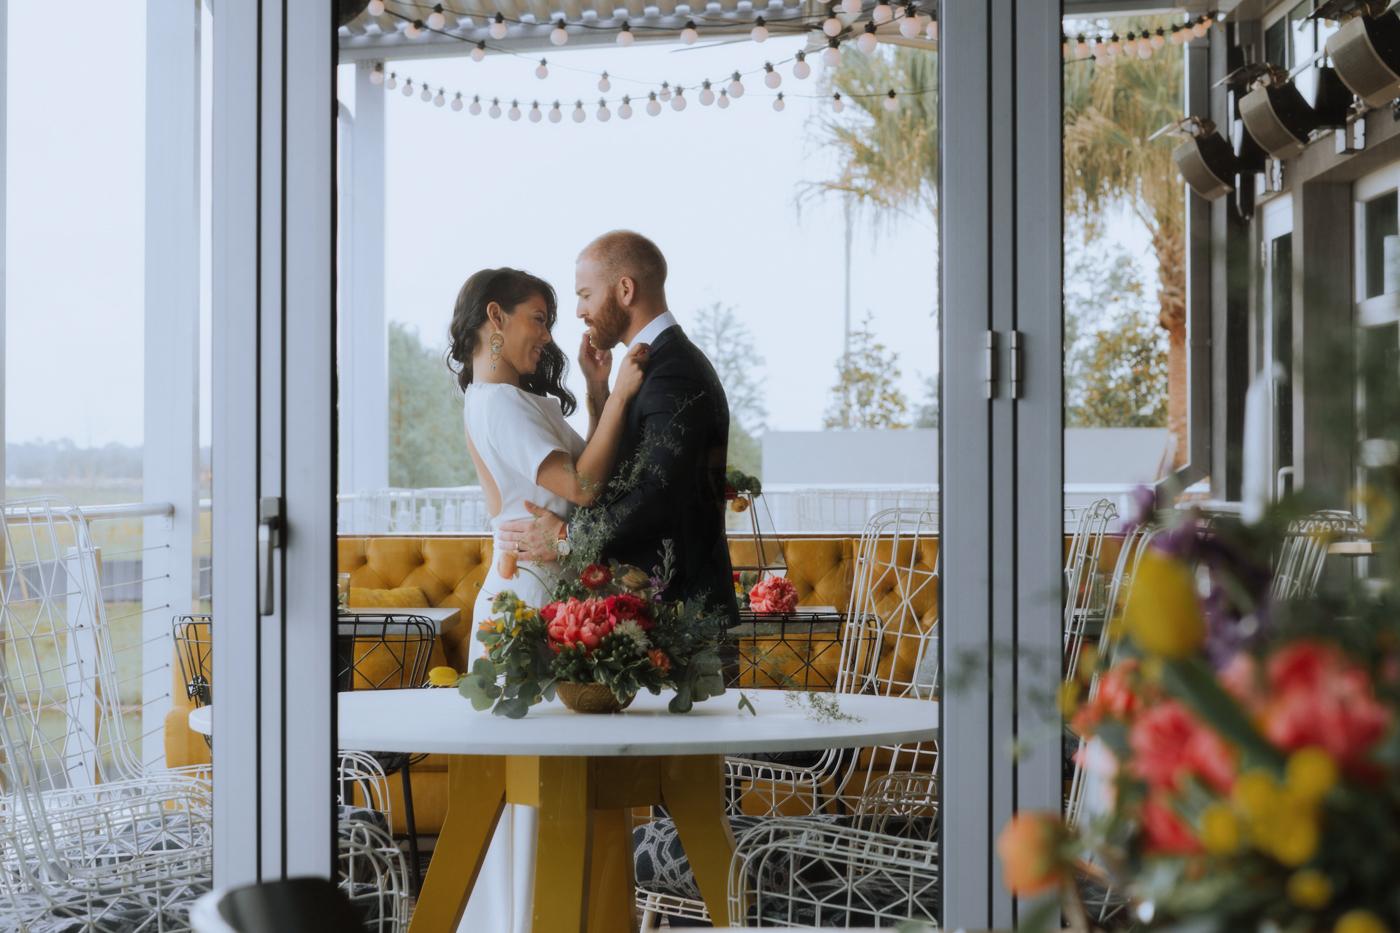 Wedding | Canvas Market | Lake Nona-Orlando, FL  | Vanessa Boy Photography | vanessaboy.com-219.com |Green Wedding Shoes.jpg